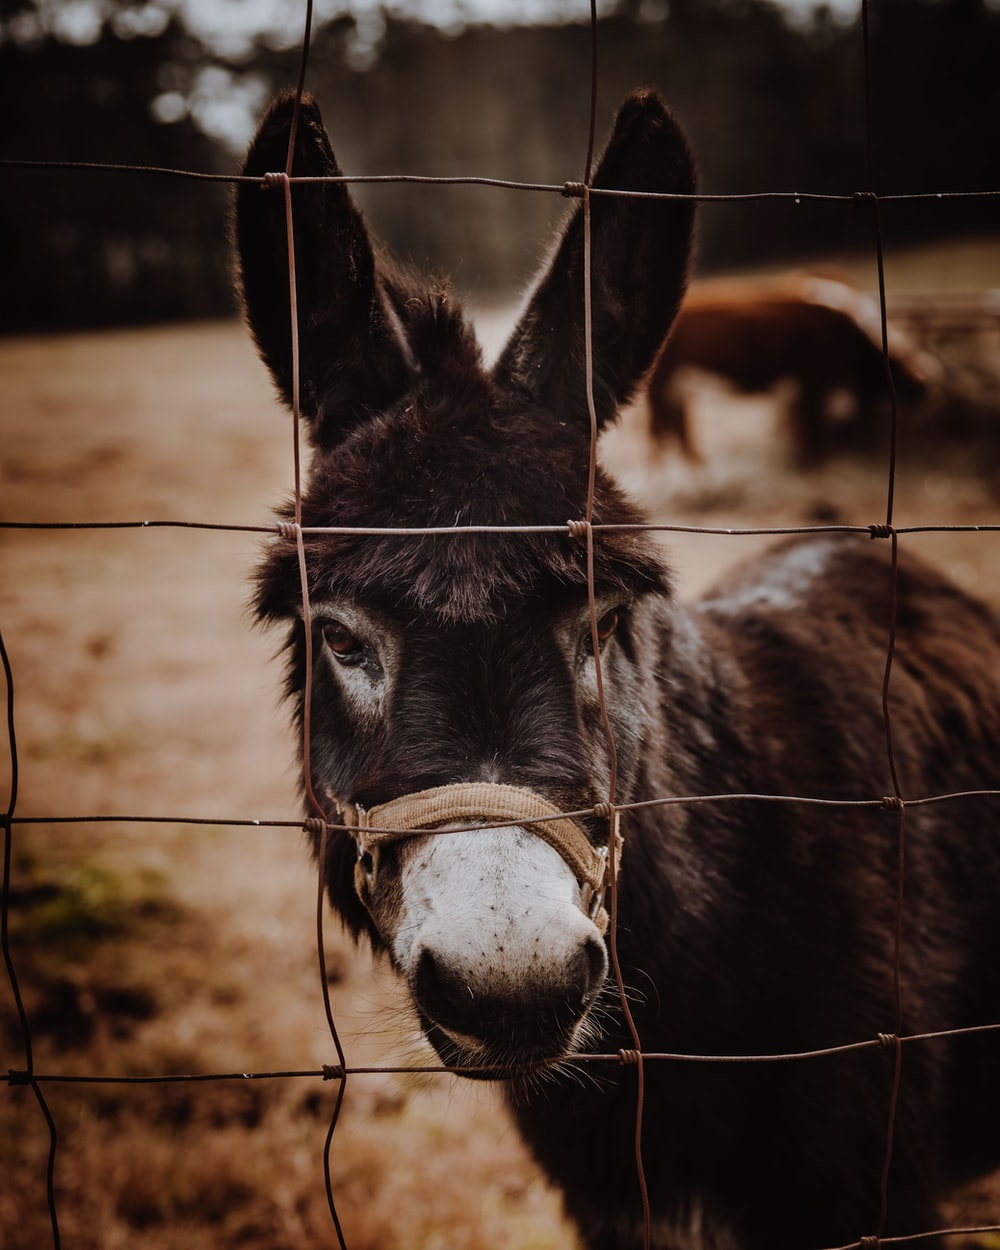 black donkey standing on brown soil during daytime